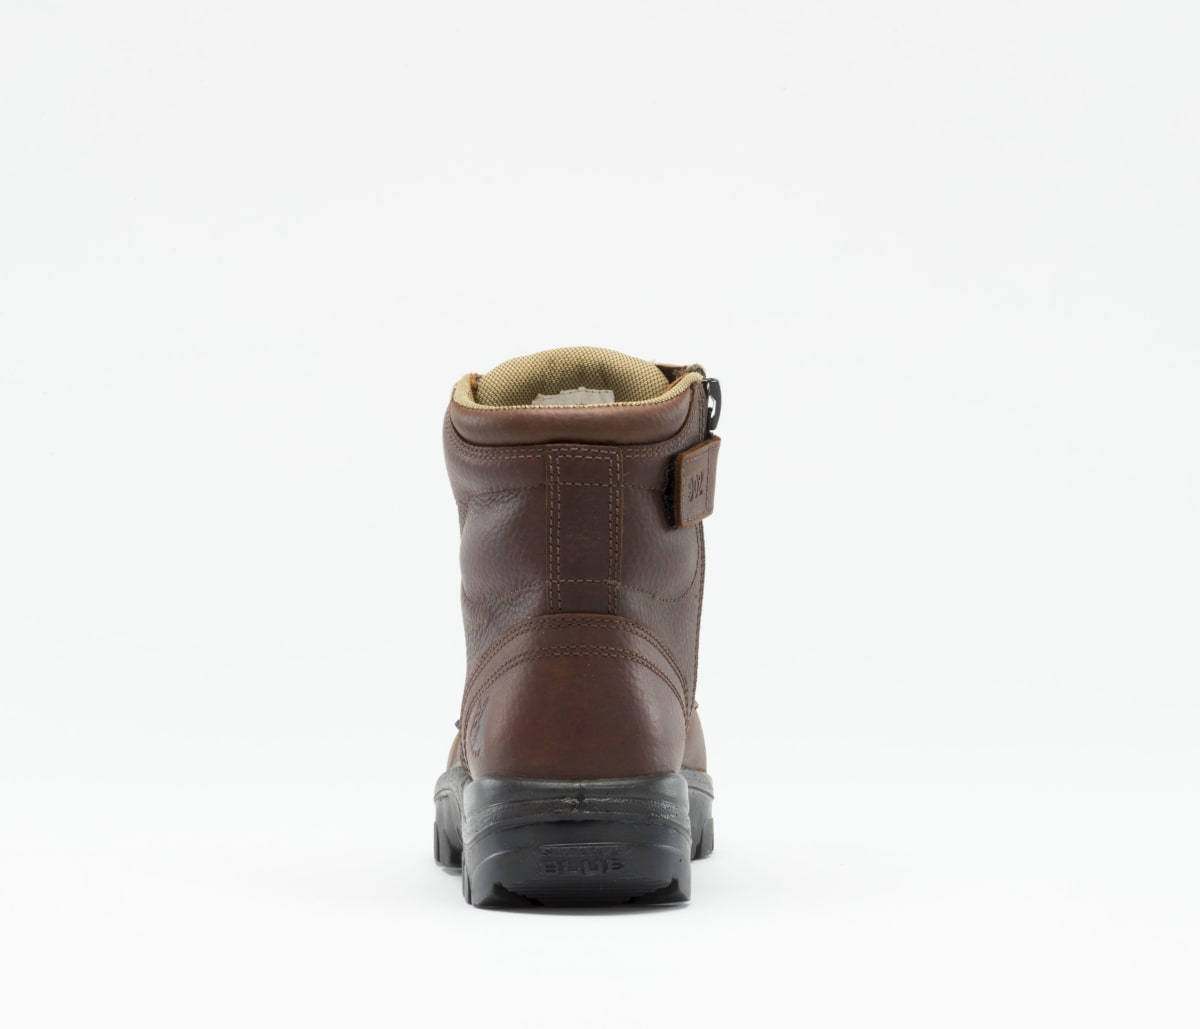 Argyle Zip: Met / PR Midsole / Bump Cap - Oak